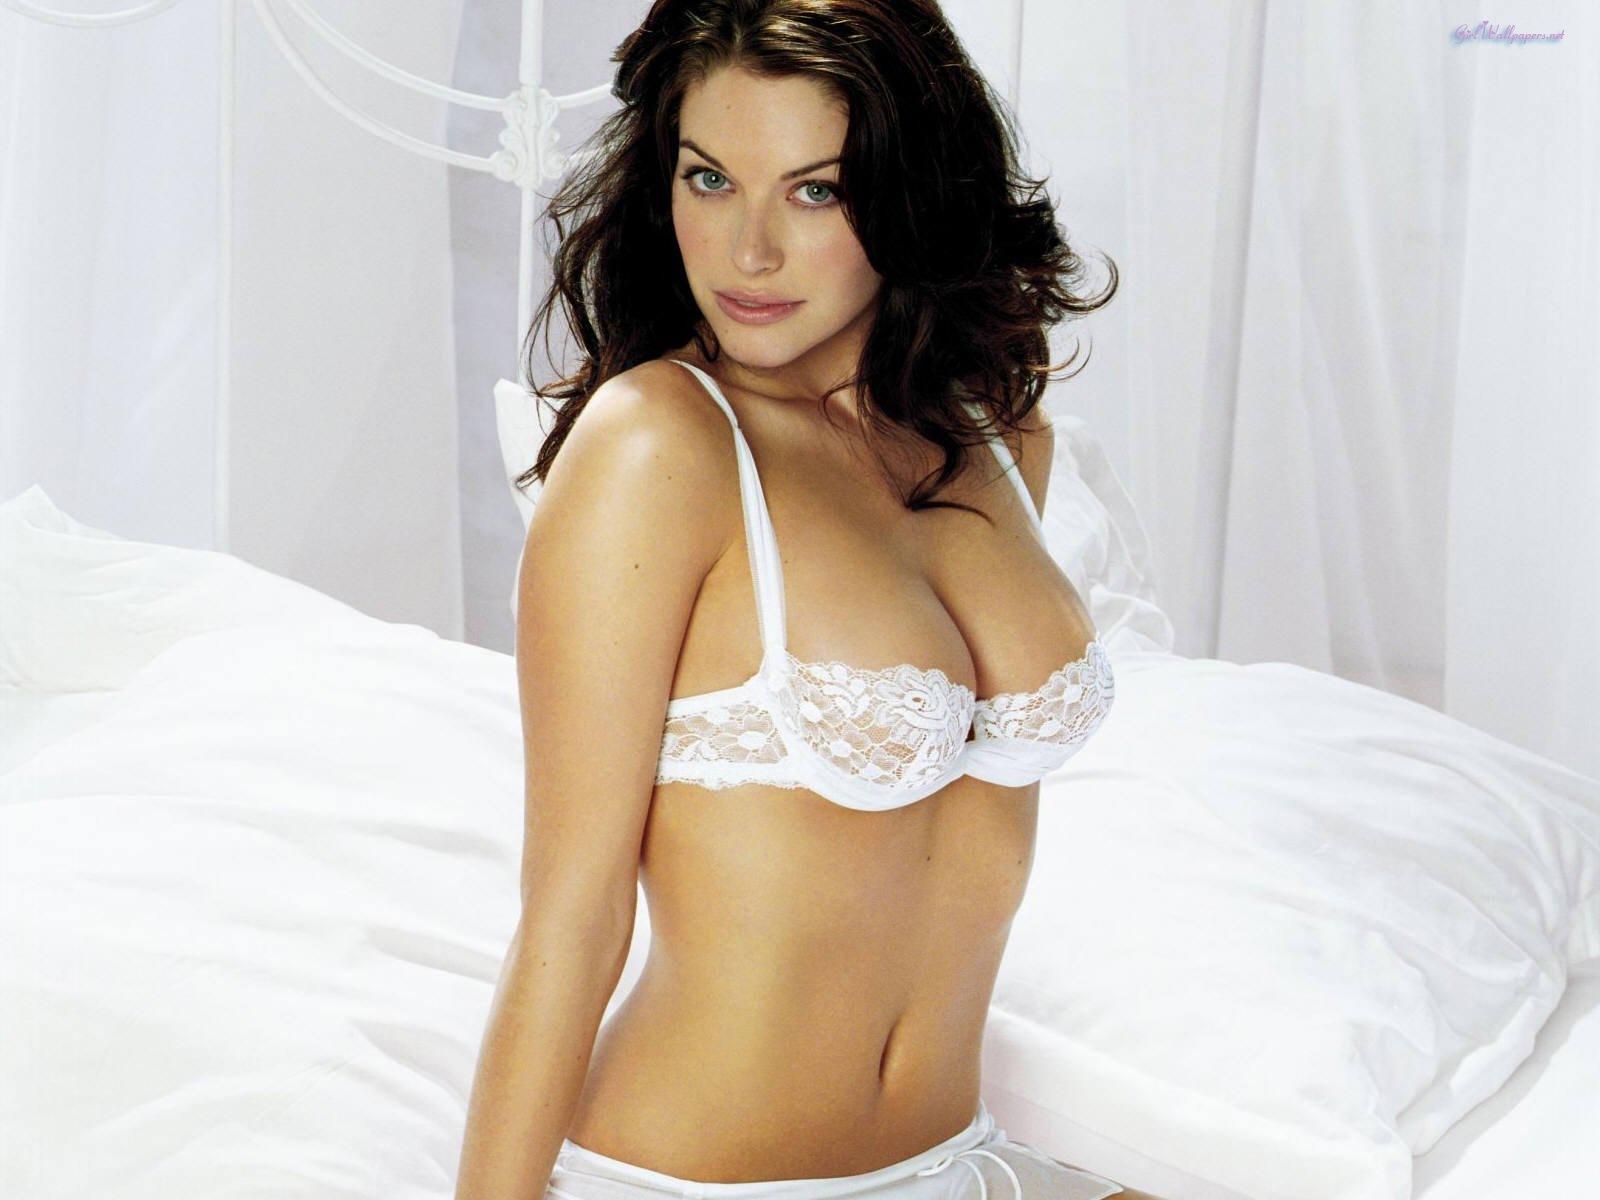 hollywood female stars recent - photo #34